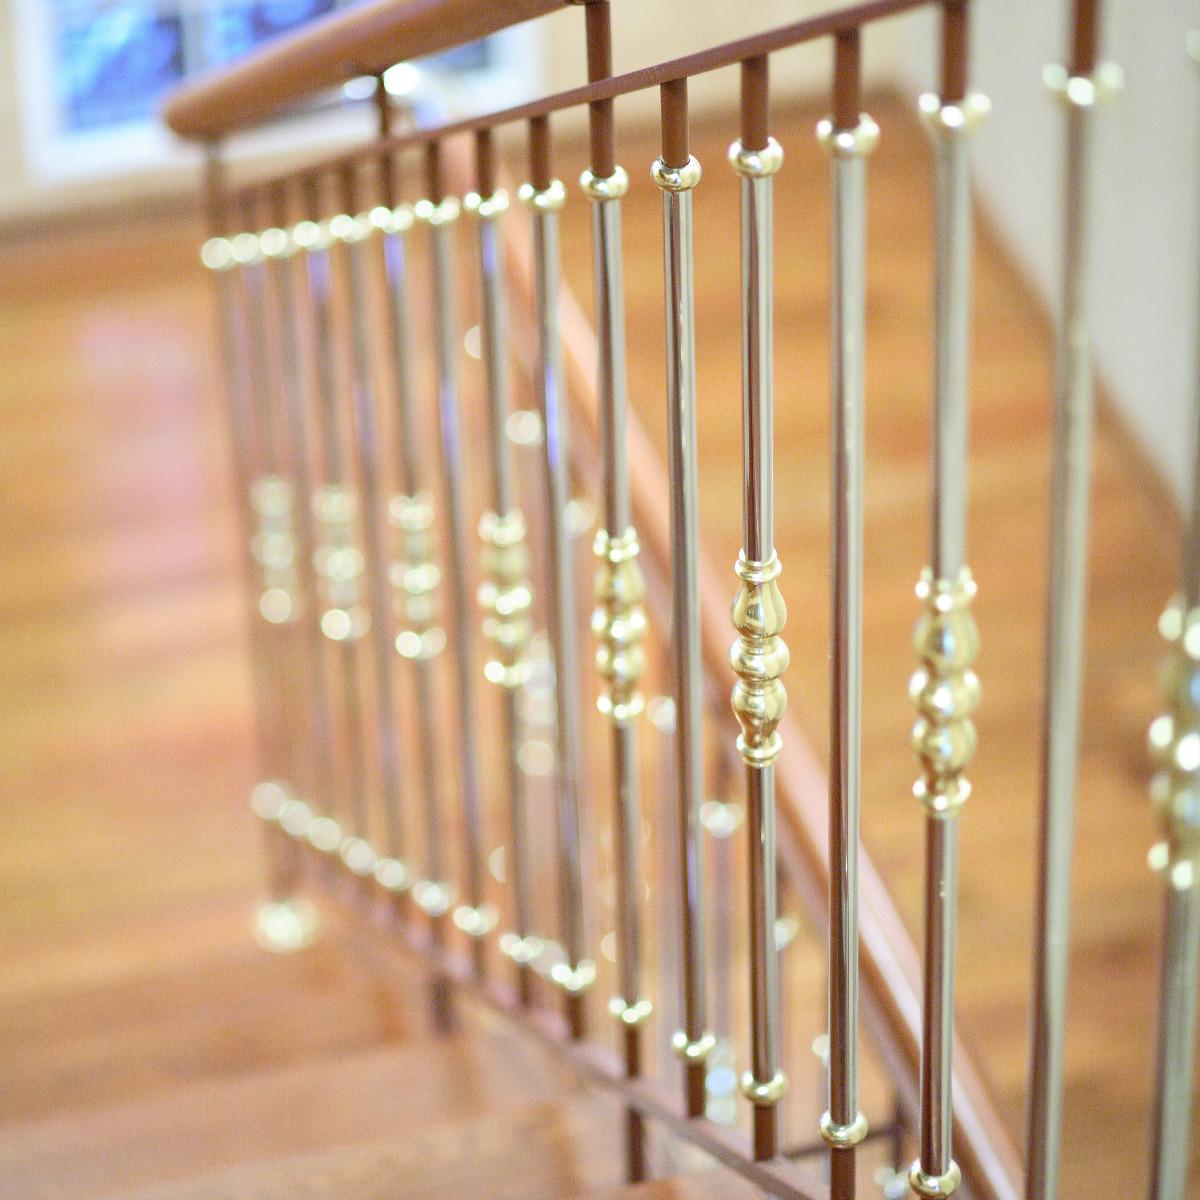 Grande Forge Harmonie Series Design GF-HM001